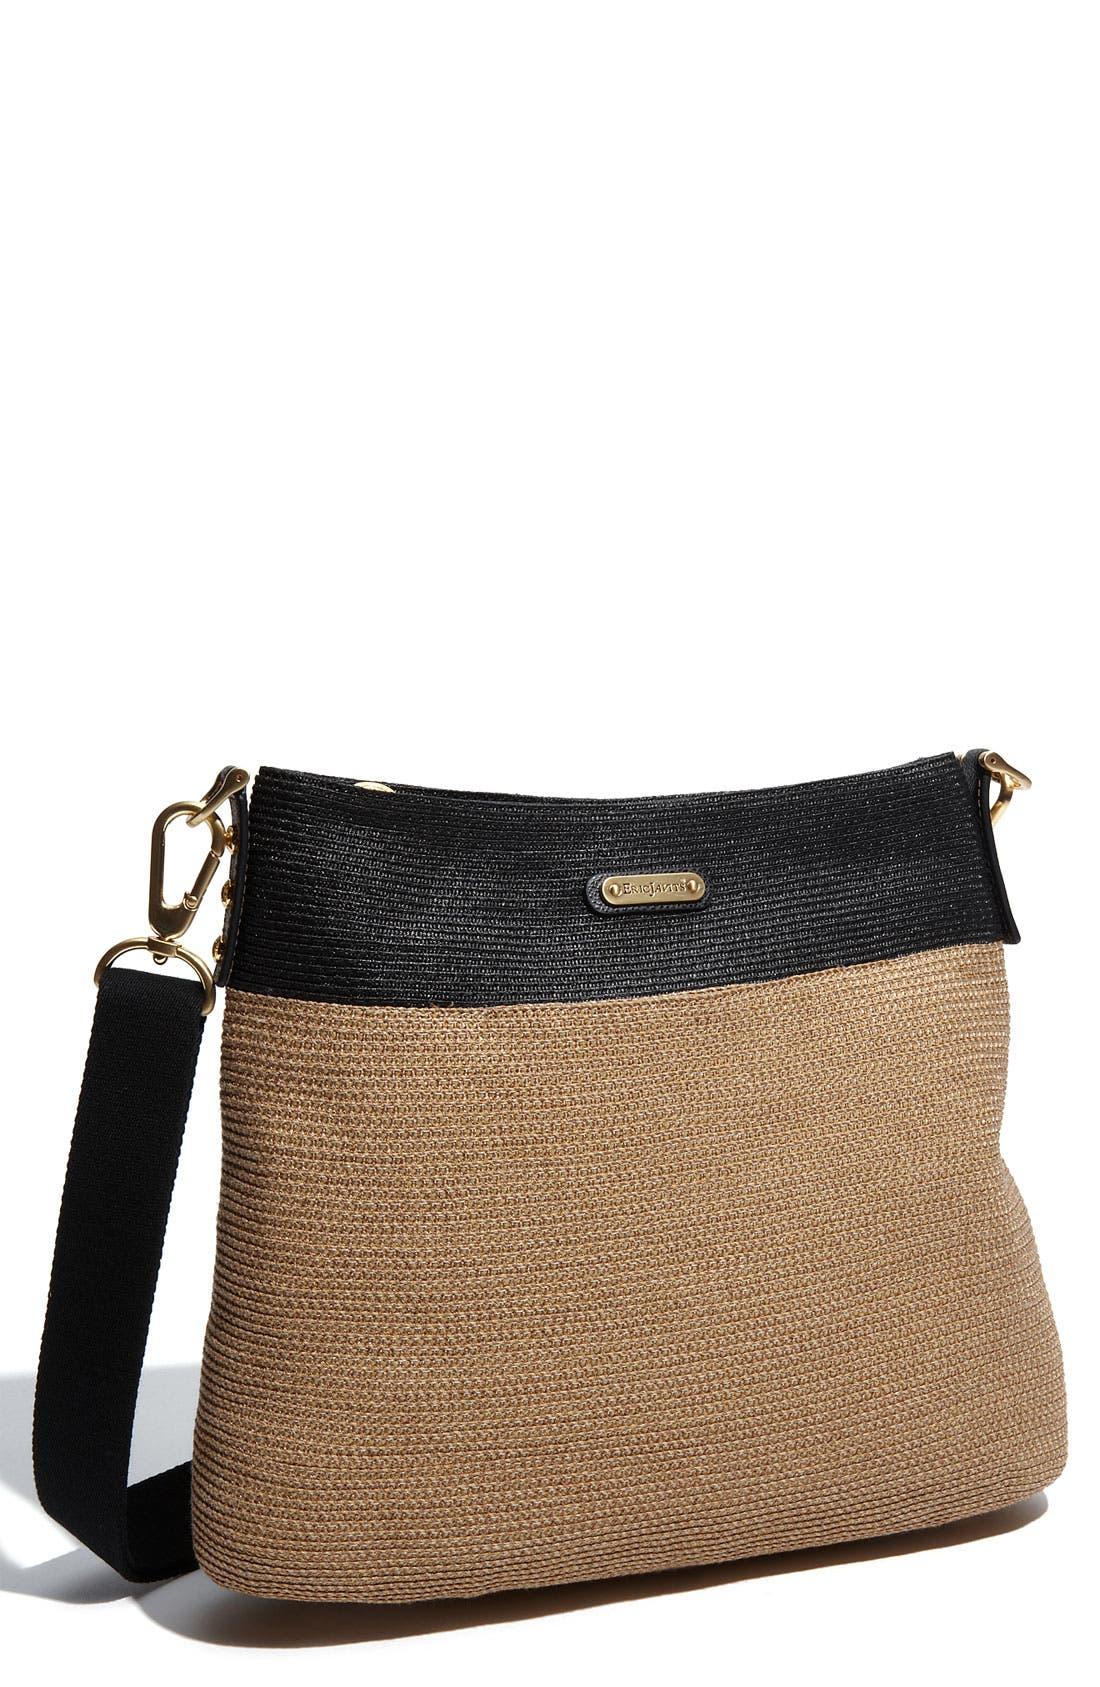 Alternate Image 1 Selected - Eric Javits 'Escape' Convertible Squishee® Shoulder Bag